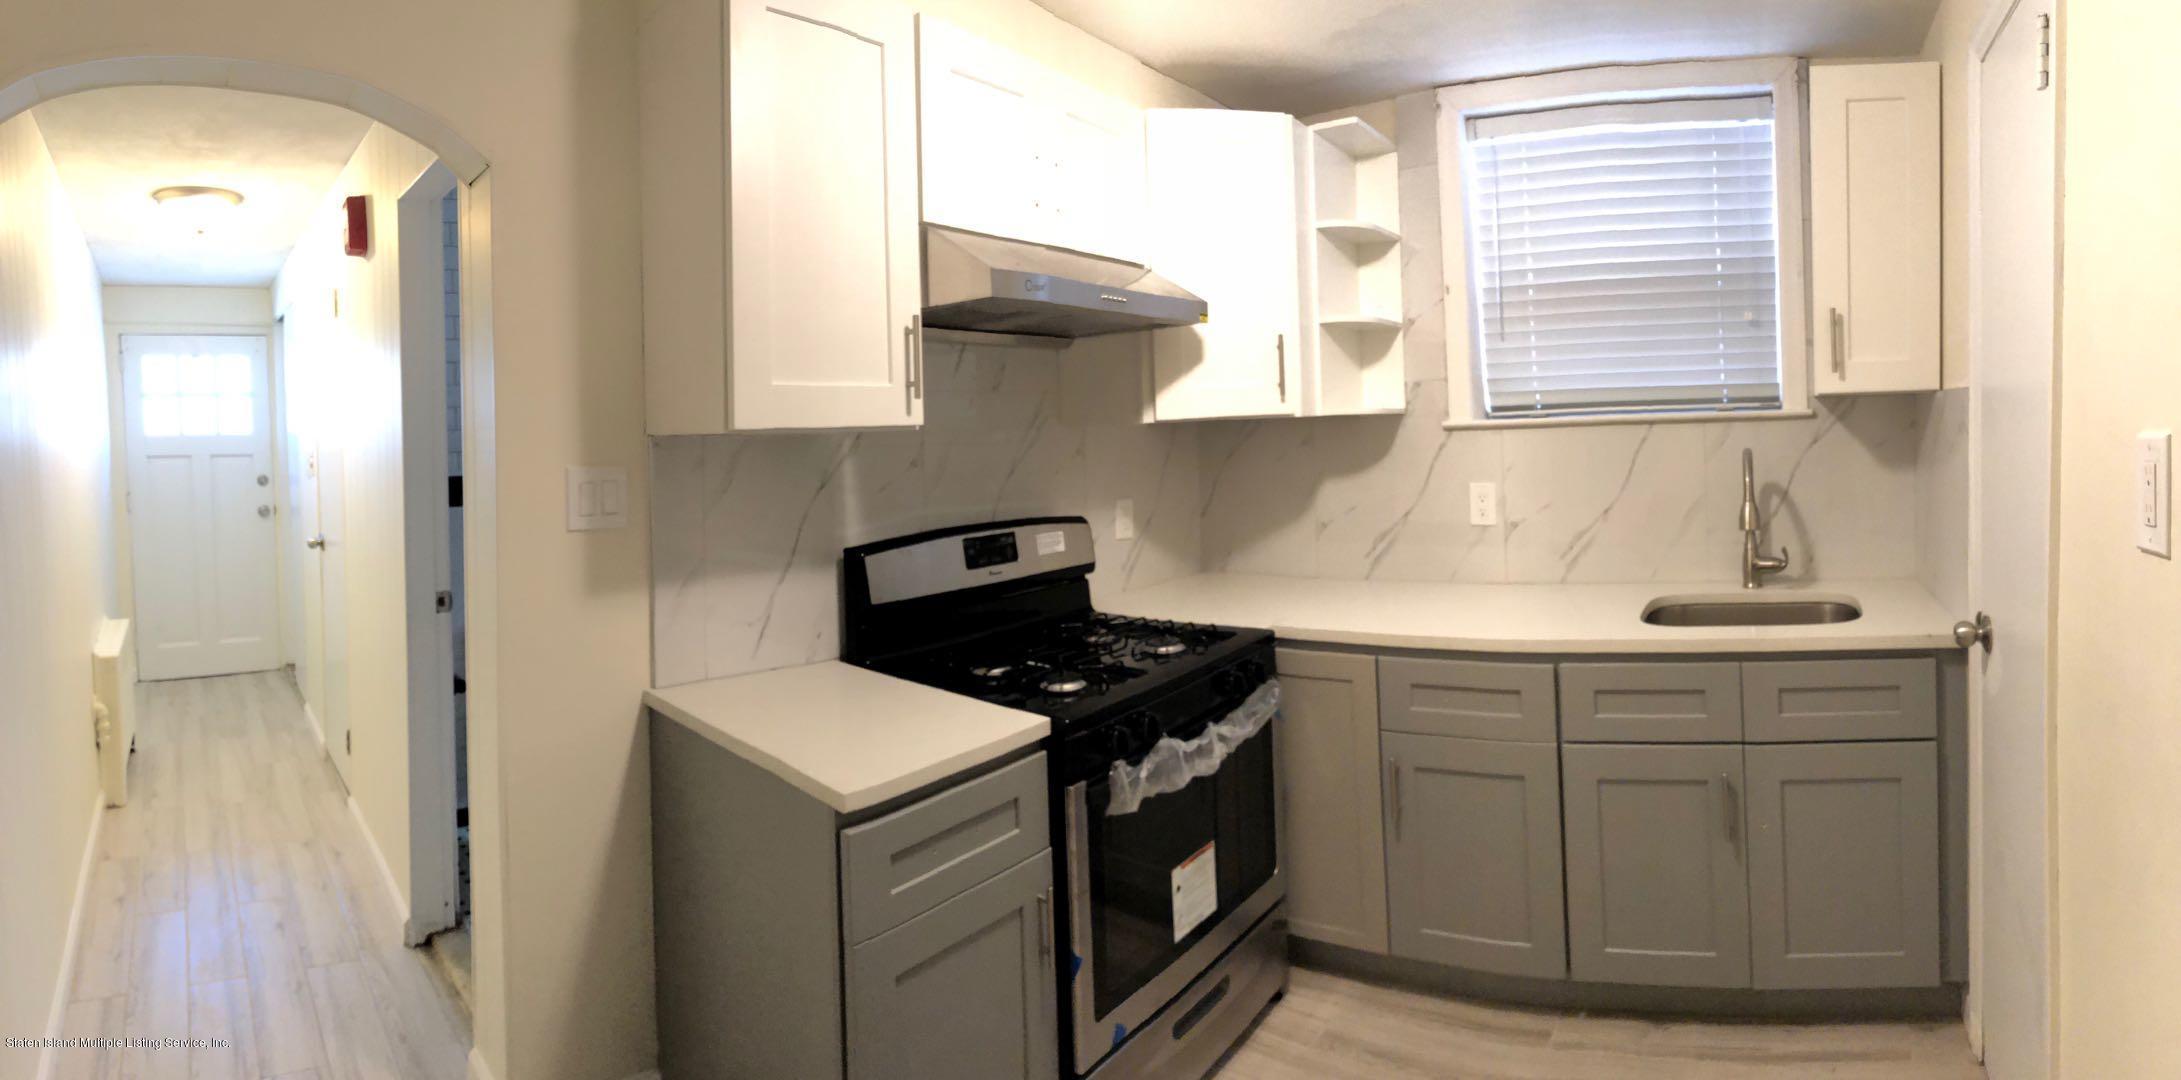 Two Family - Detached 27 Arthur Avenue  Staten Island, NY 10305, MLS-1128566-9